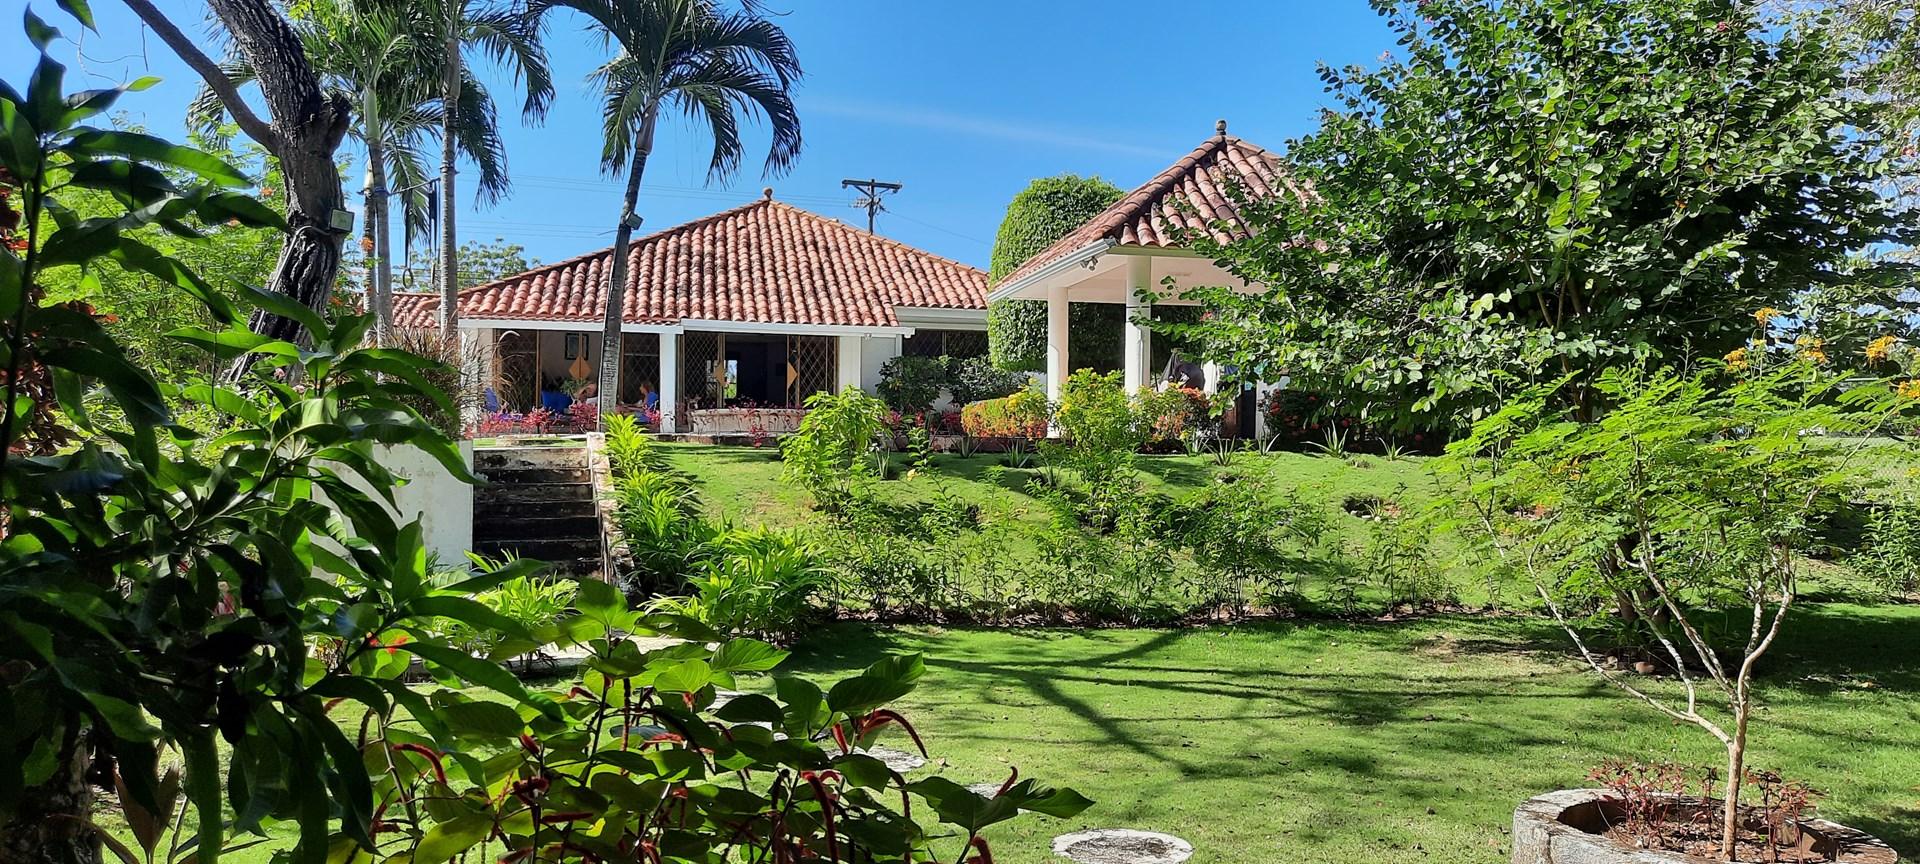 TROPICAL HOUSE WITH POOL FOR SALE IN CORONADO PANAMA